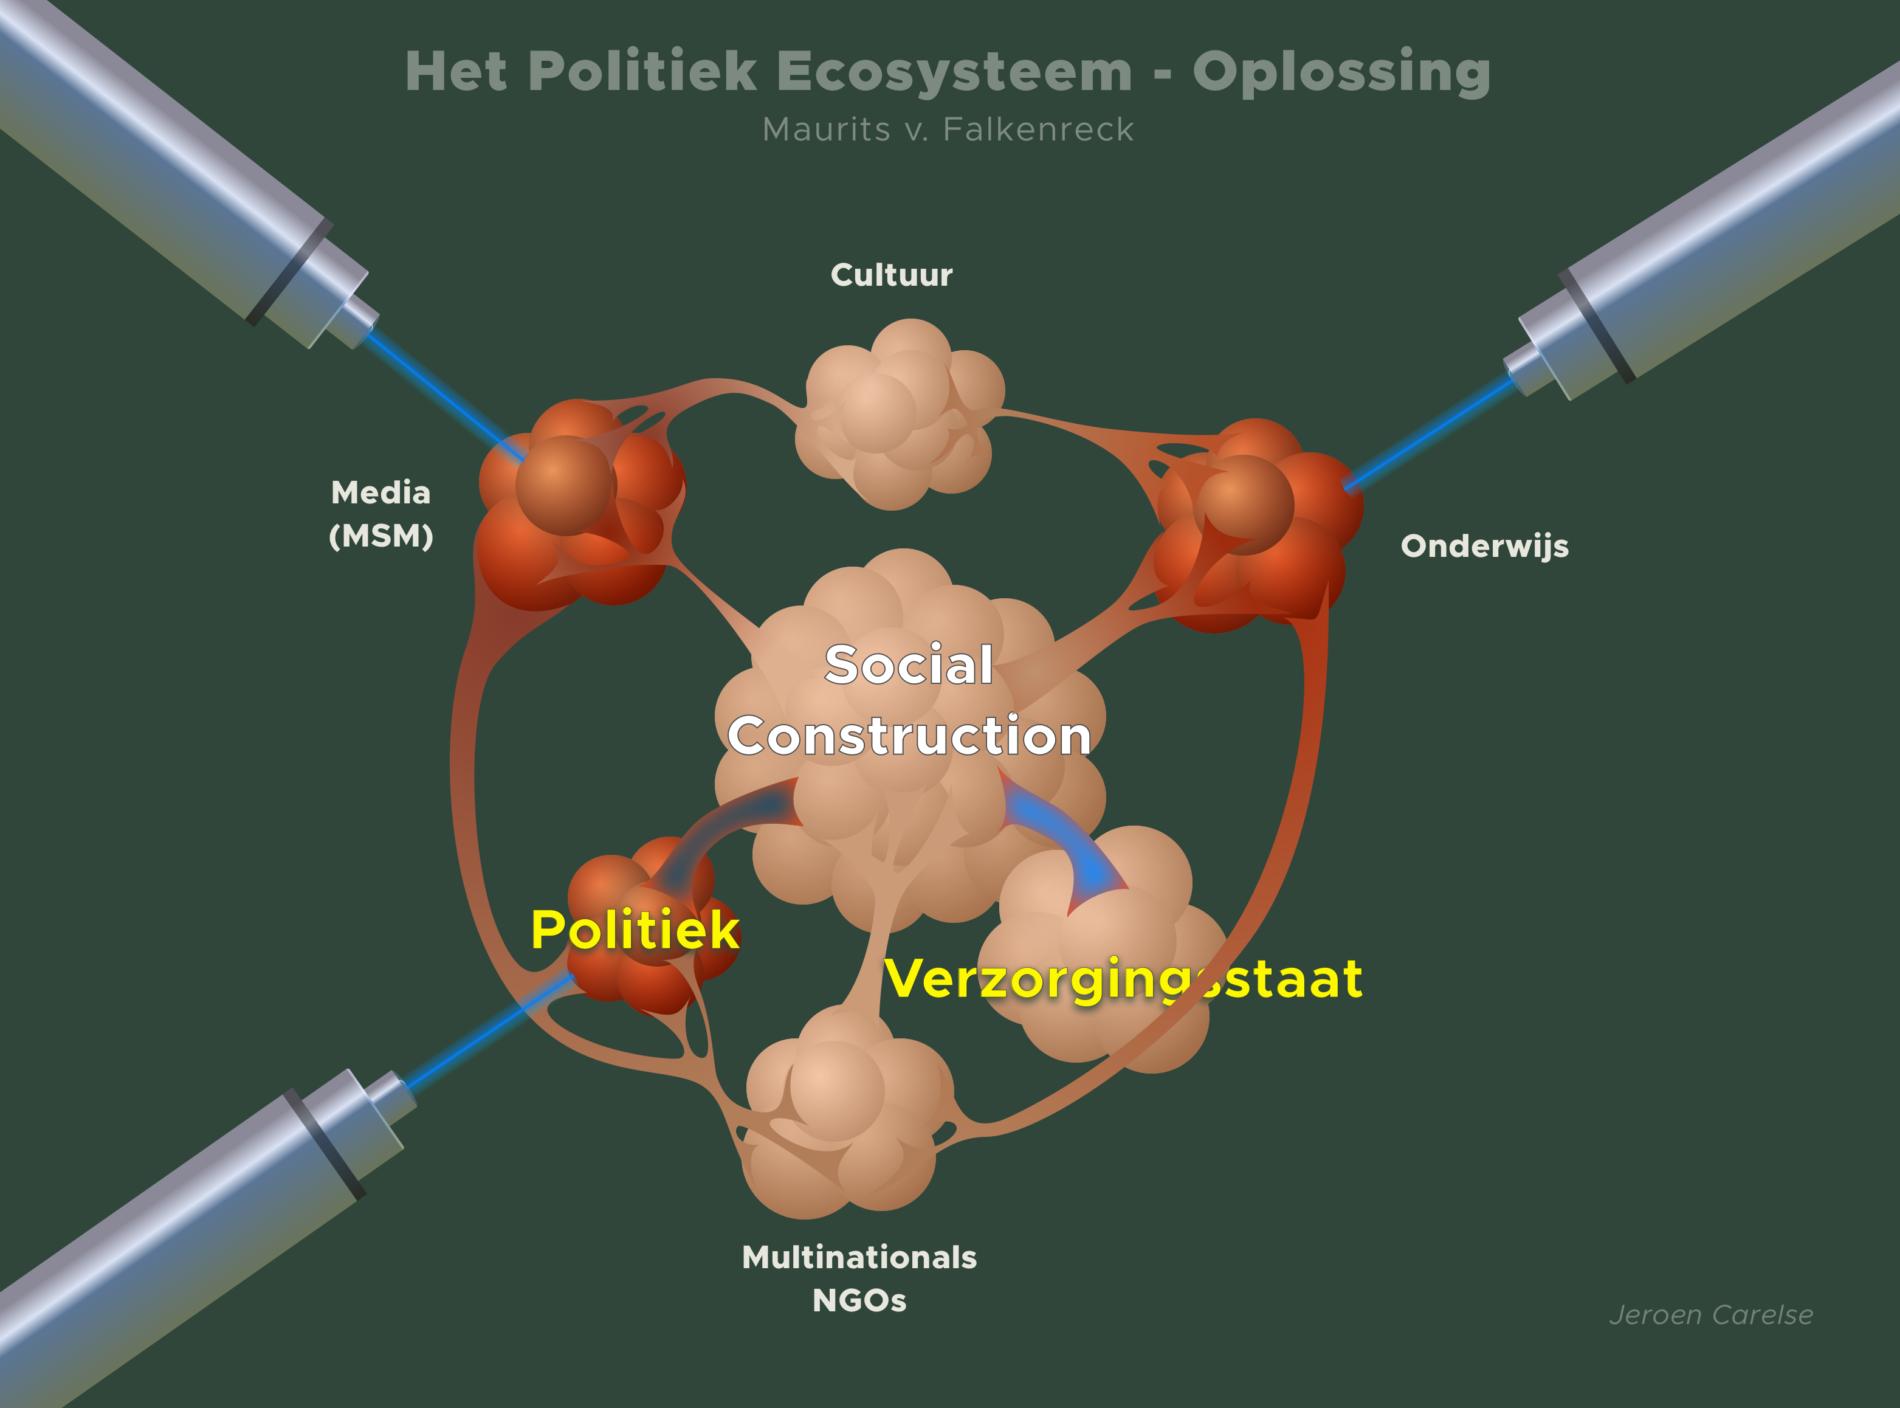 Het Politiek Ecosysteem - Oplossing-v2